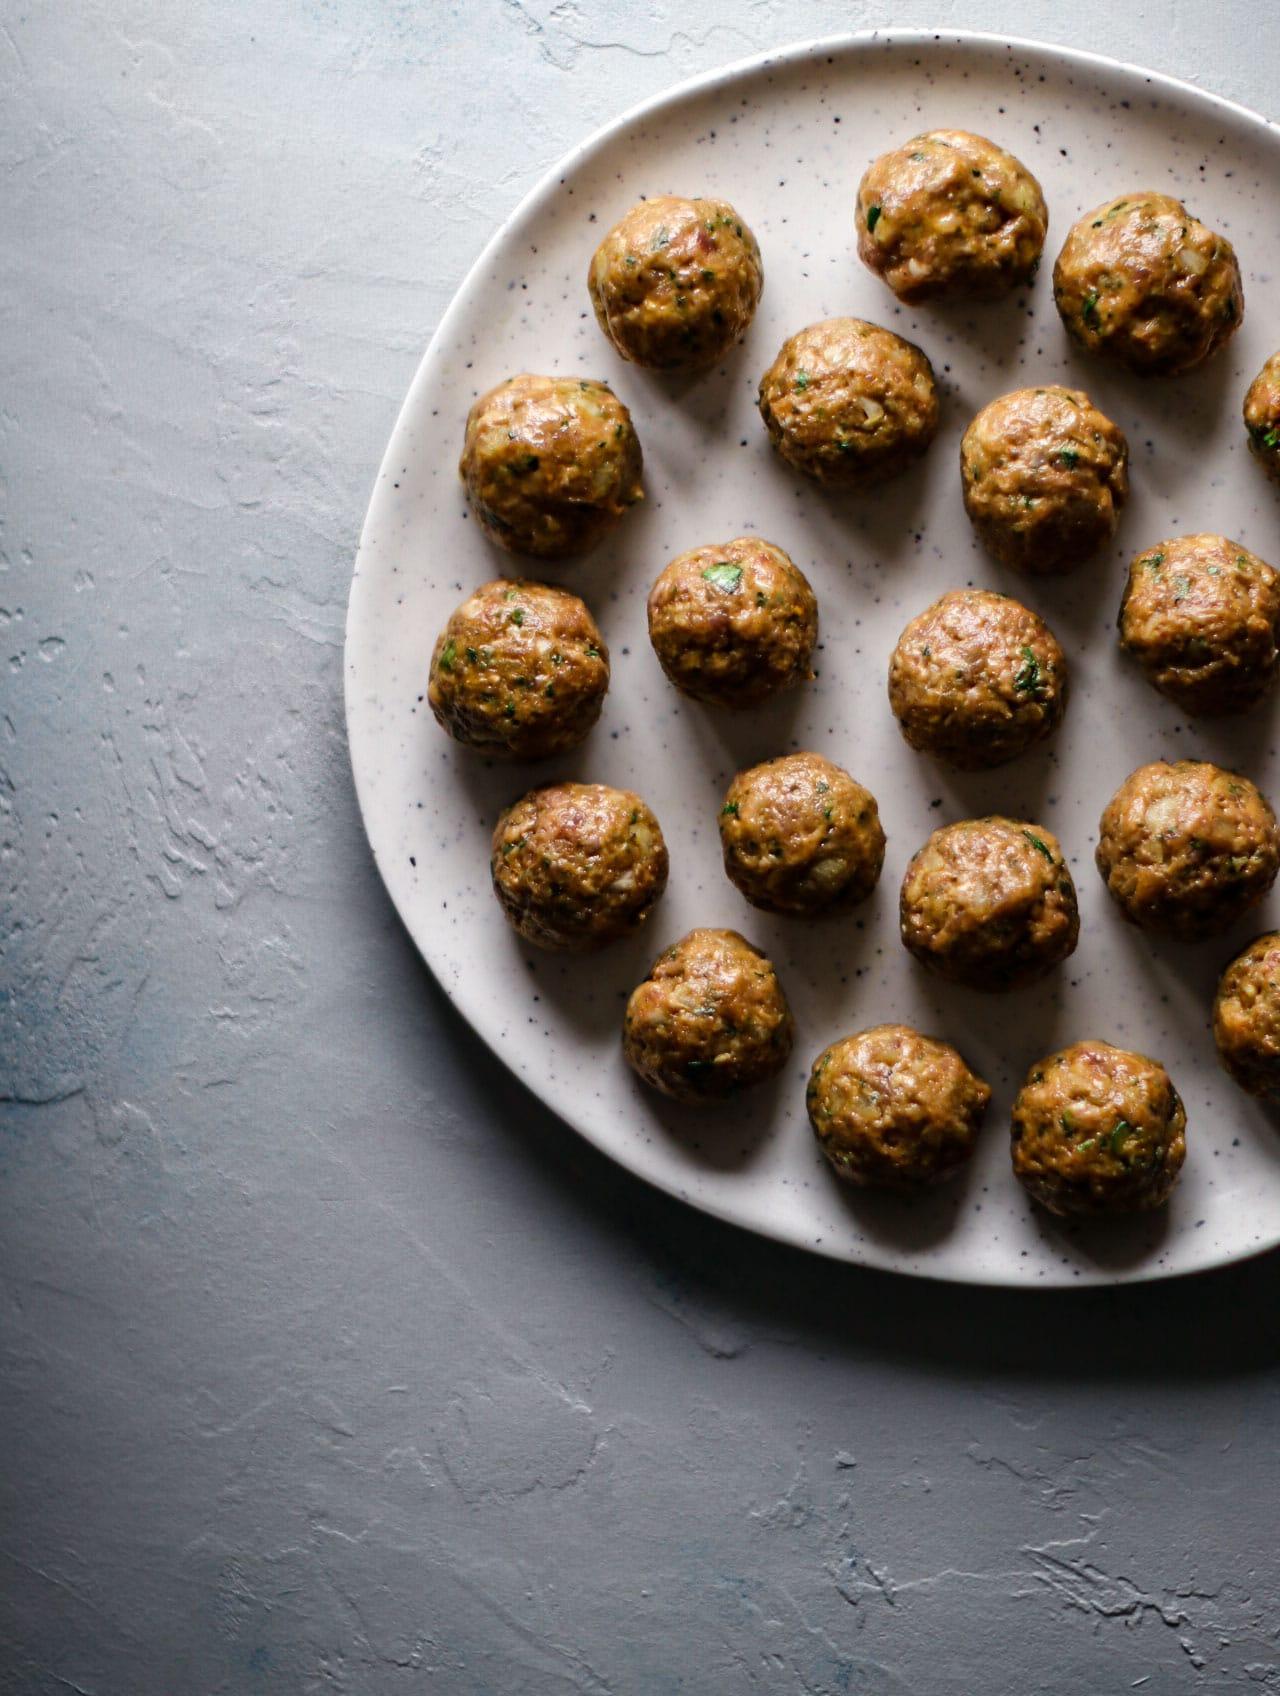 Uncooked Meatballs (Kofte) on a platter